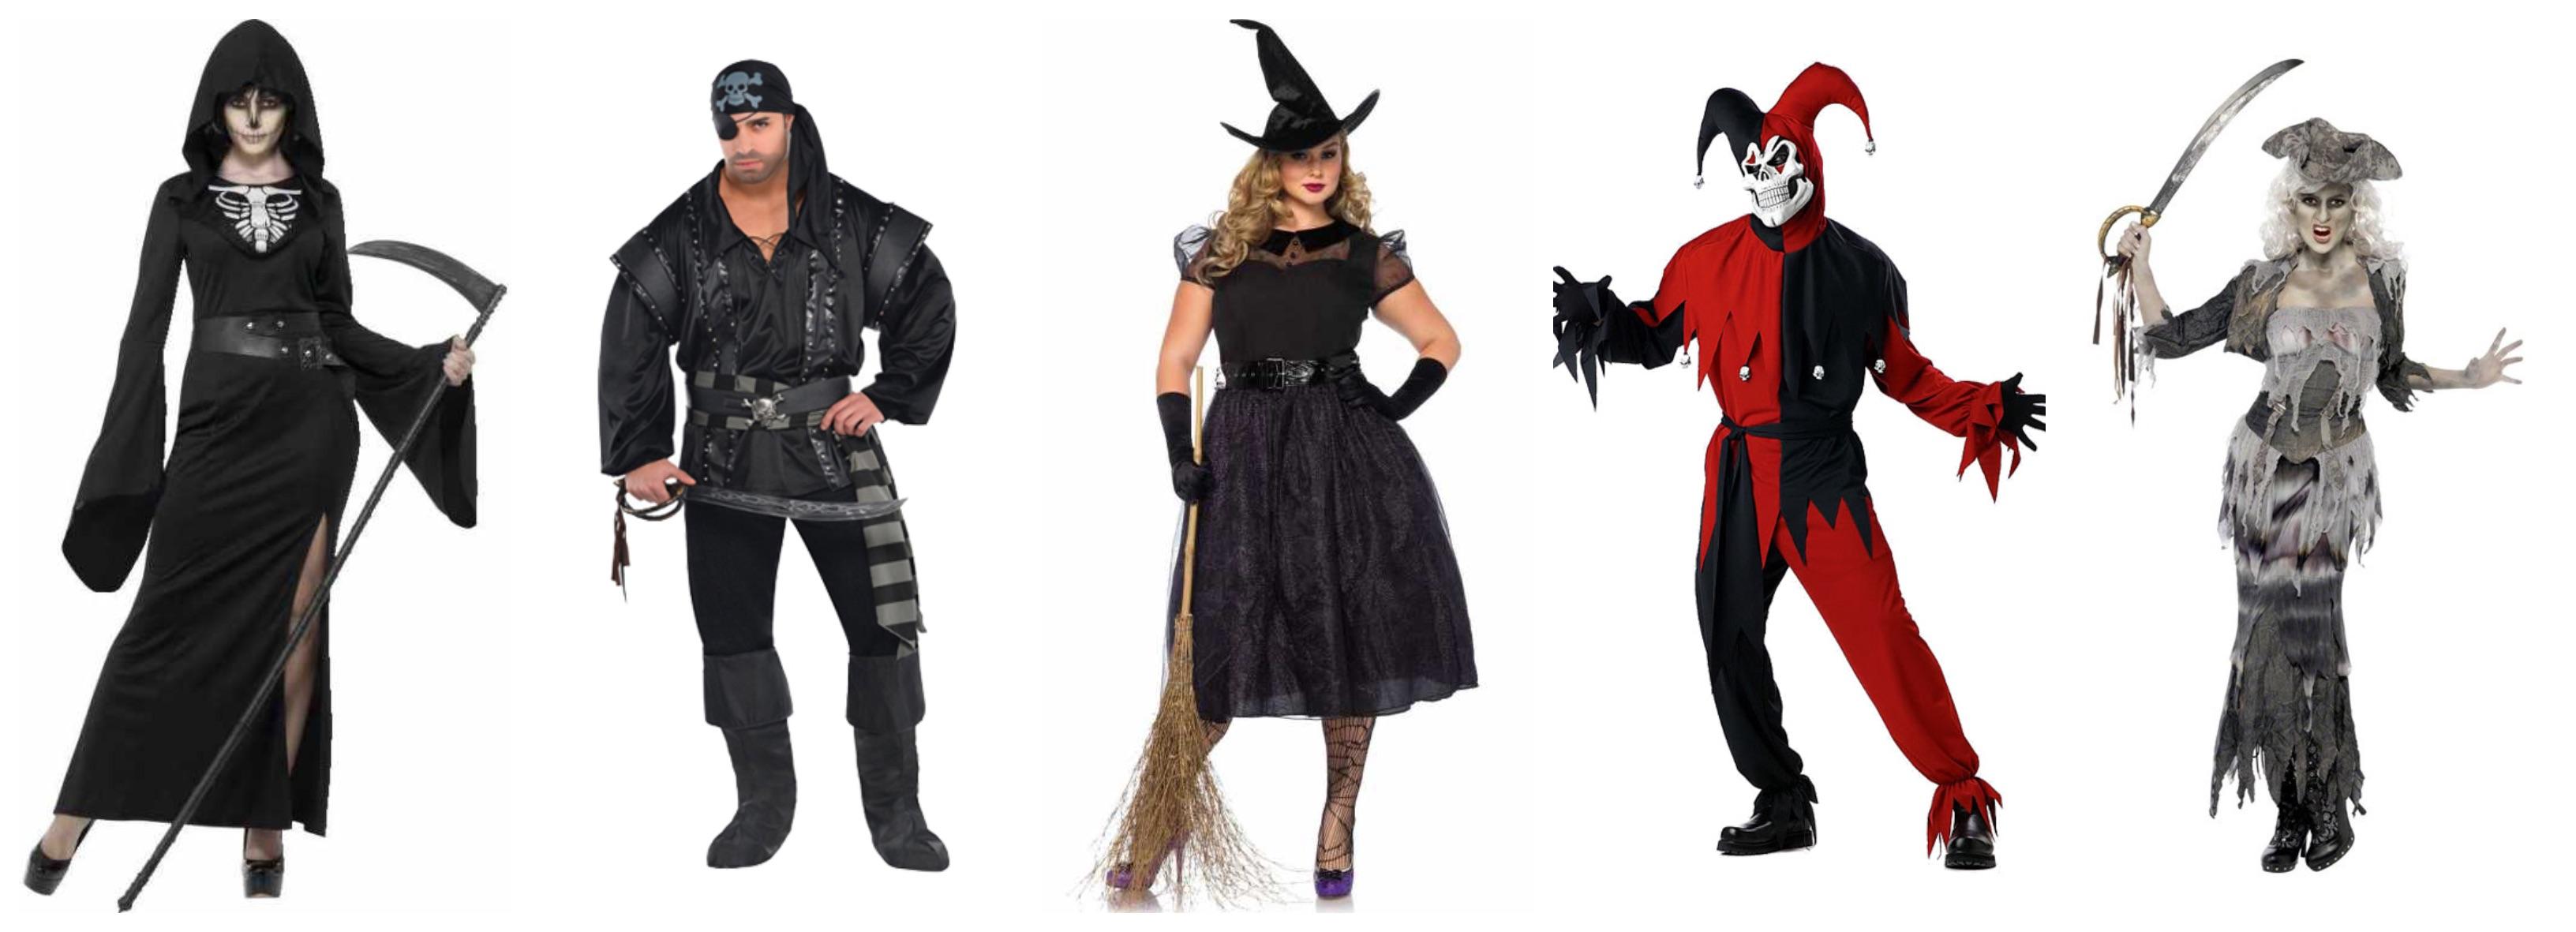 plus size kostume til halloween - Plus size kostume til halloween